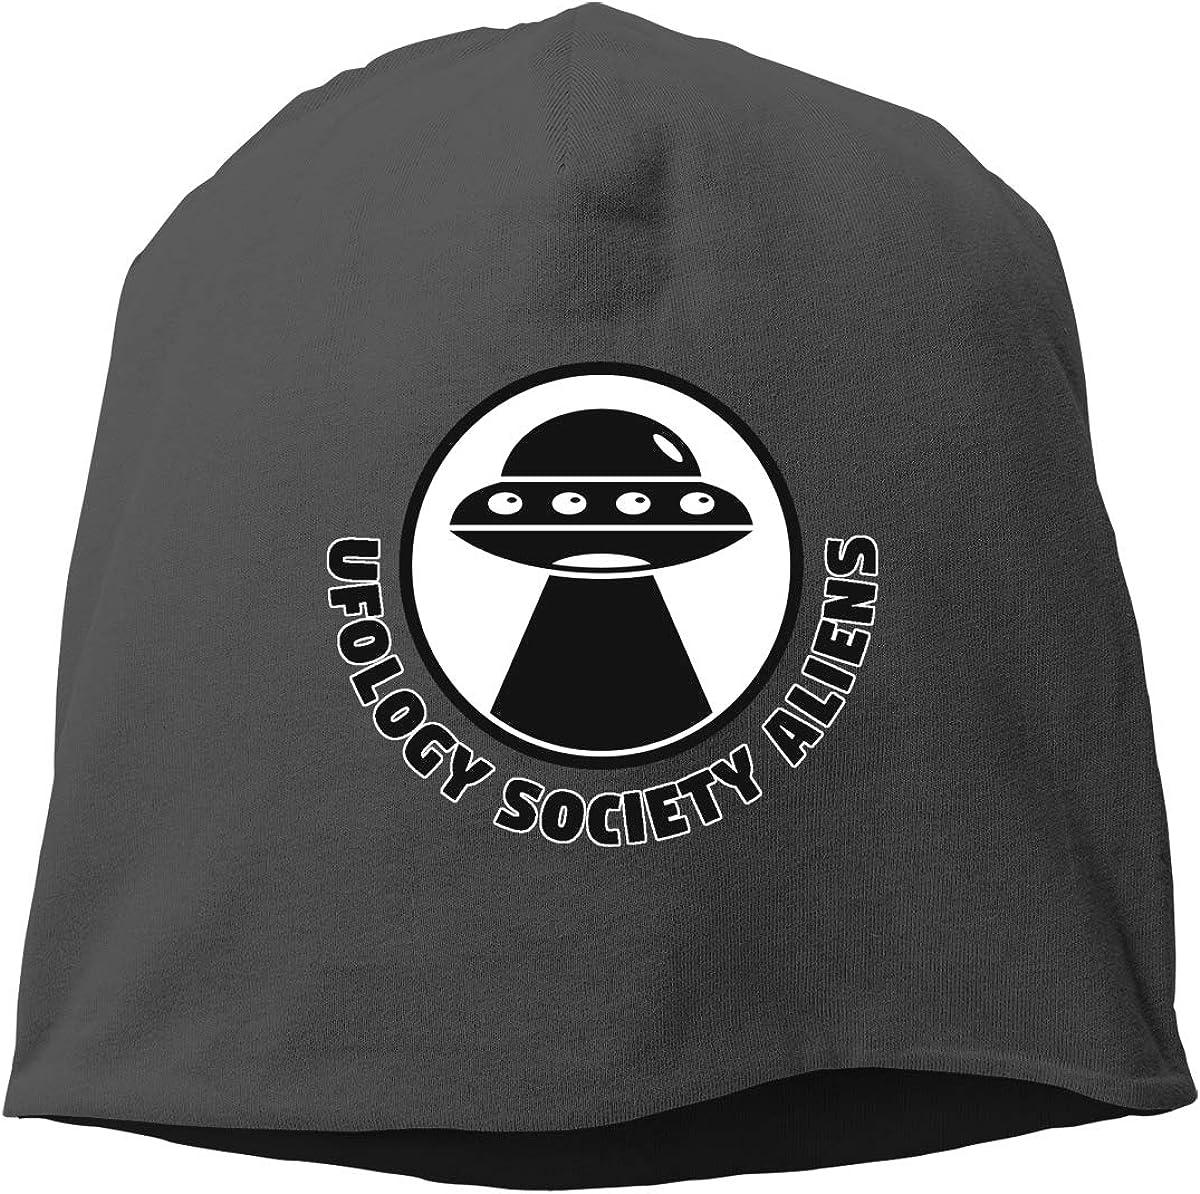 Ufology Society Aliens Logo Skull Cap Helmet Liner Beanie Cap for Men Hip Hop Hedging Head Hat